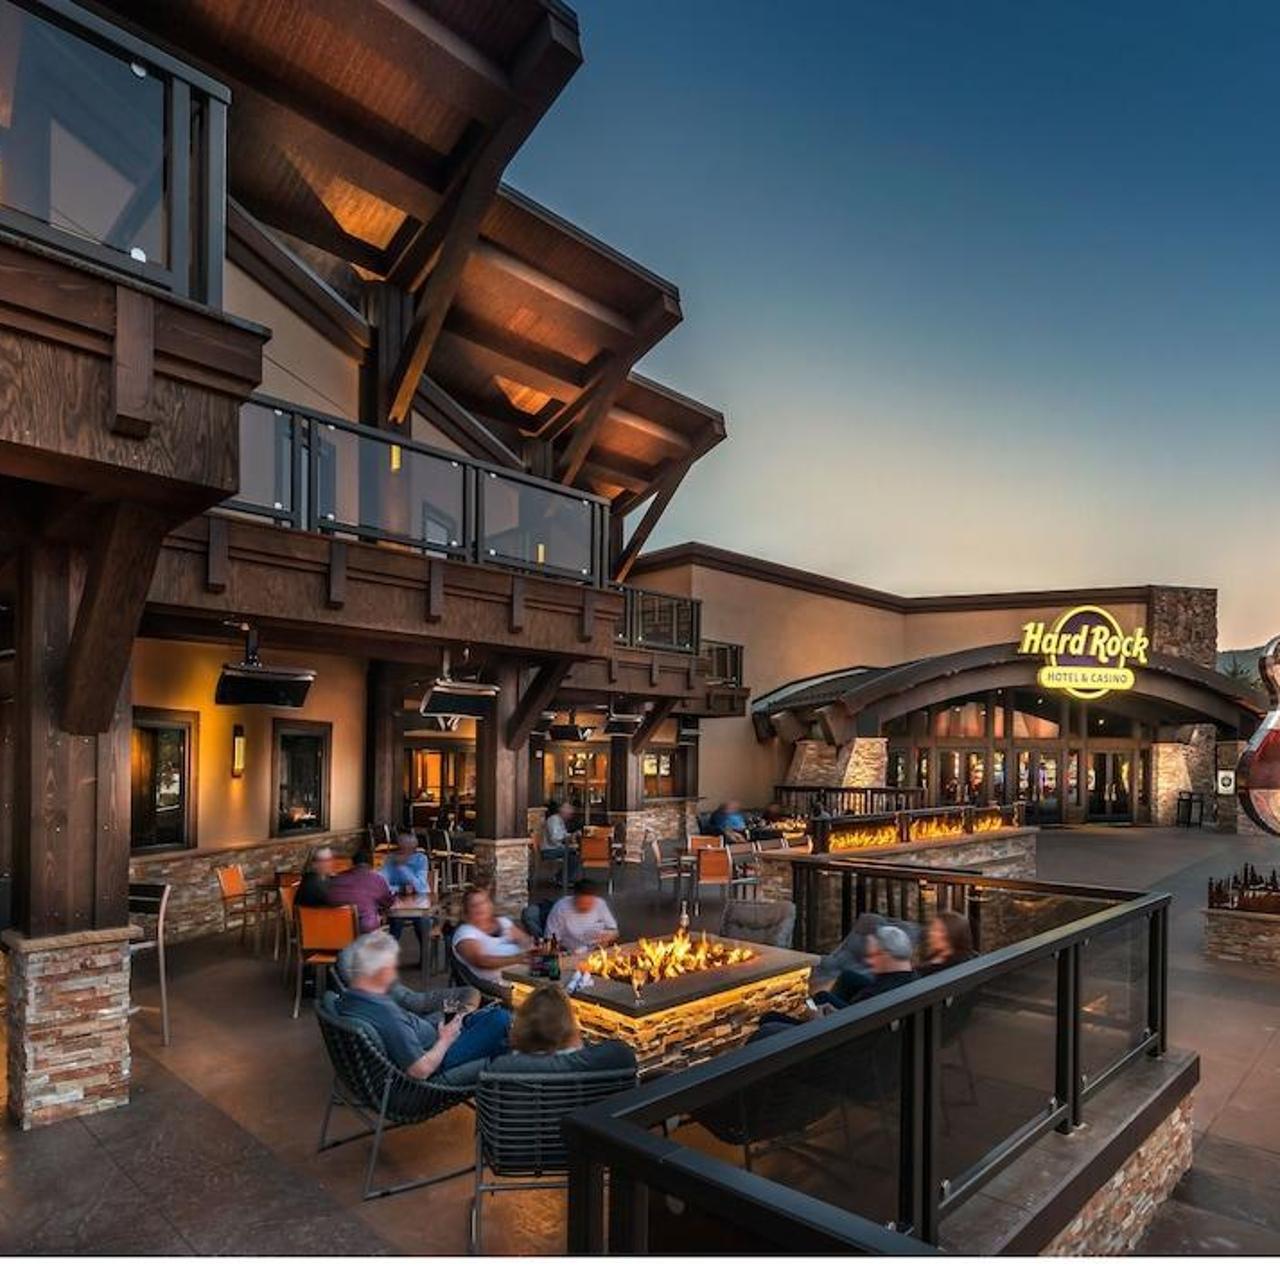 Hard Rock Hotel Casino Lake Tahoe 3 Hrs Star Hotel In